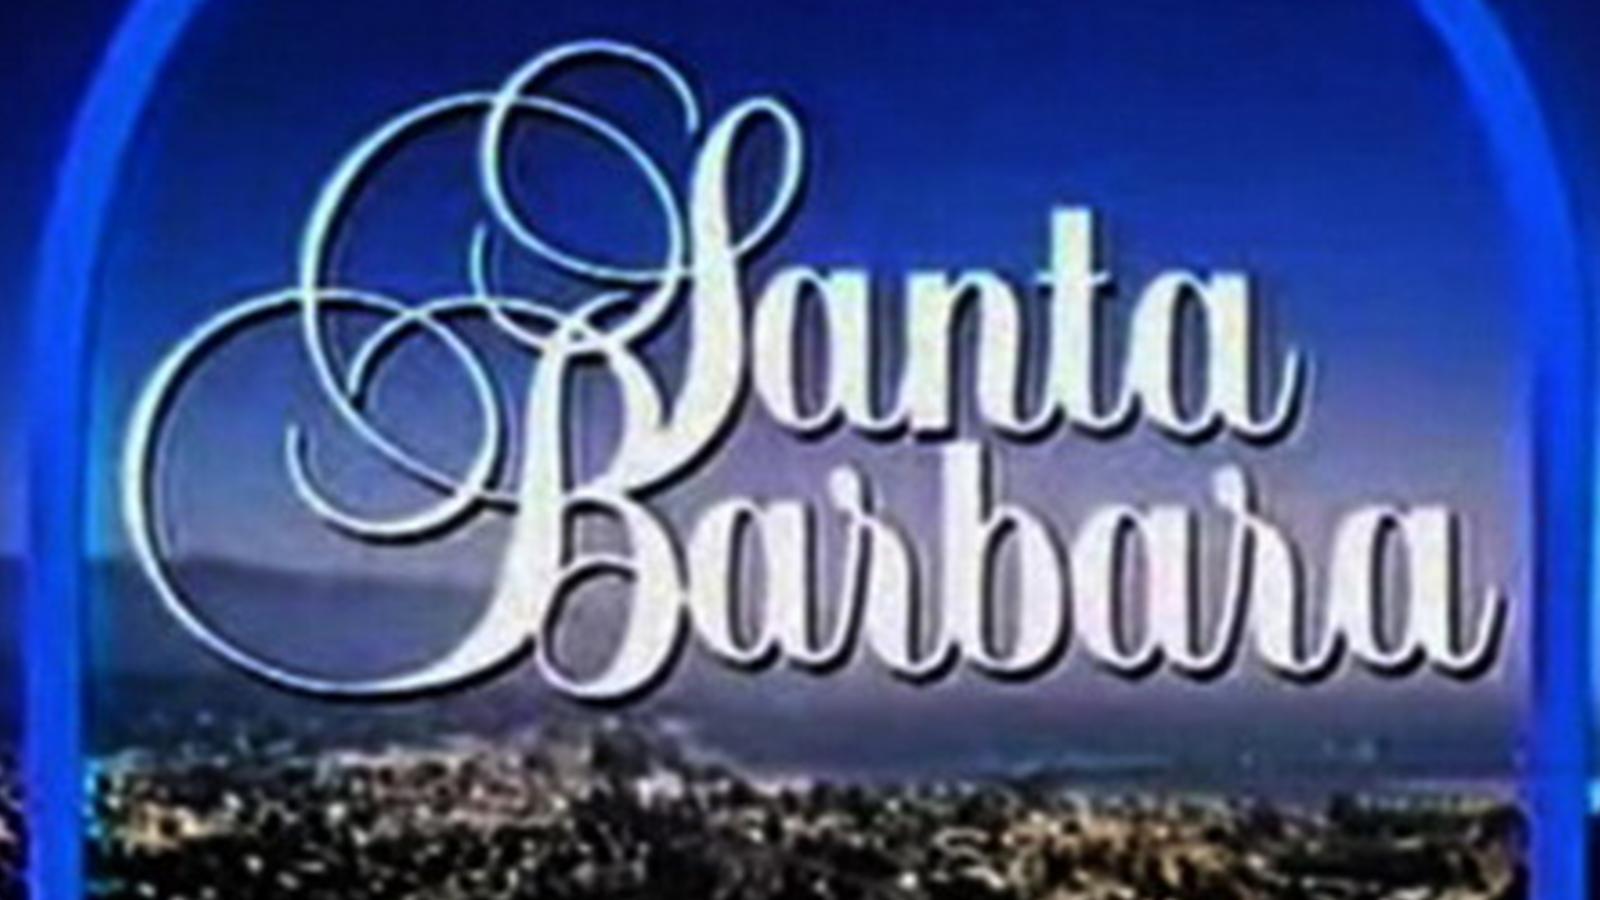 Санта барбара порно фото 3 фотография